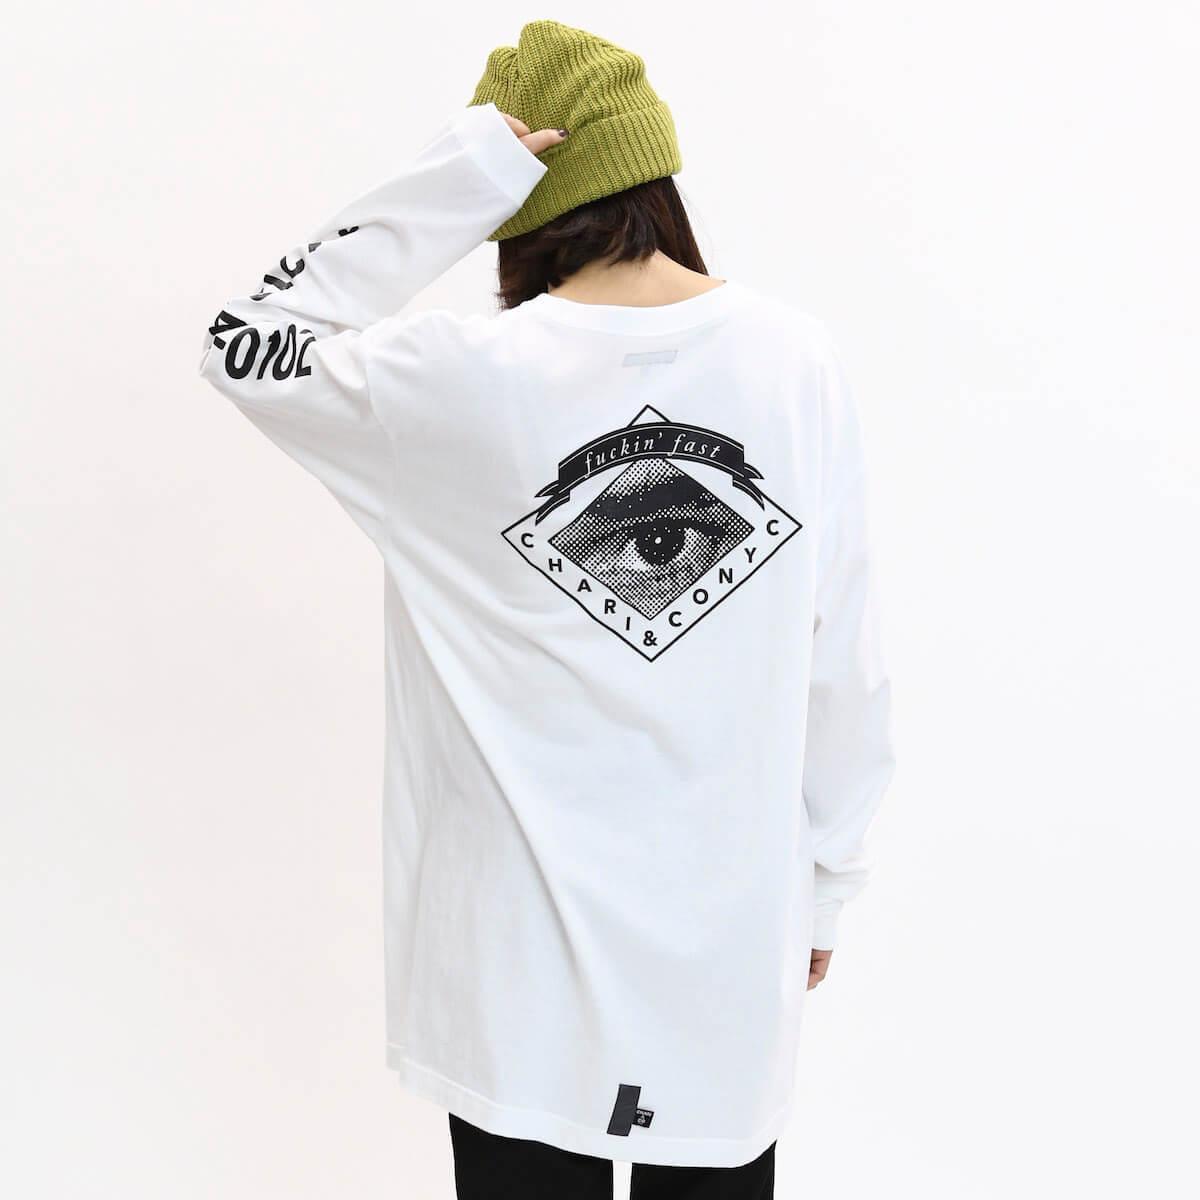 CHARI&CO 新作入荷!!!_a0221253_18083905.jpg